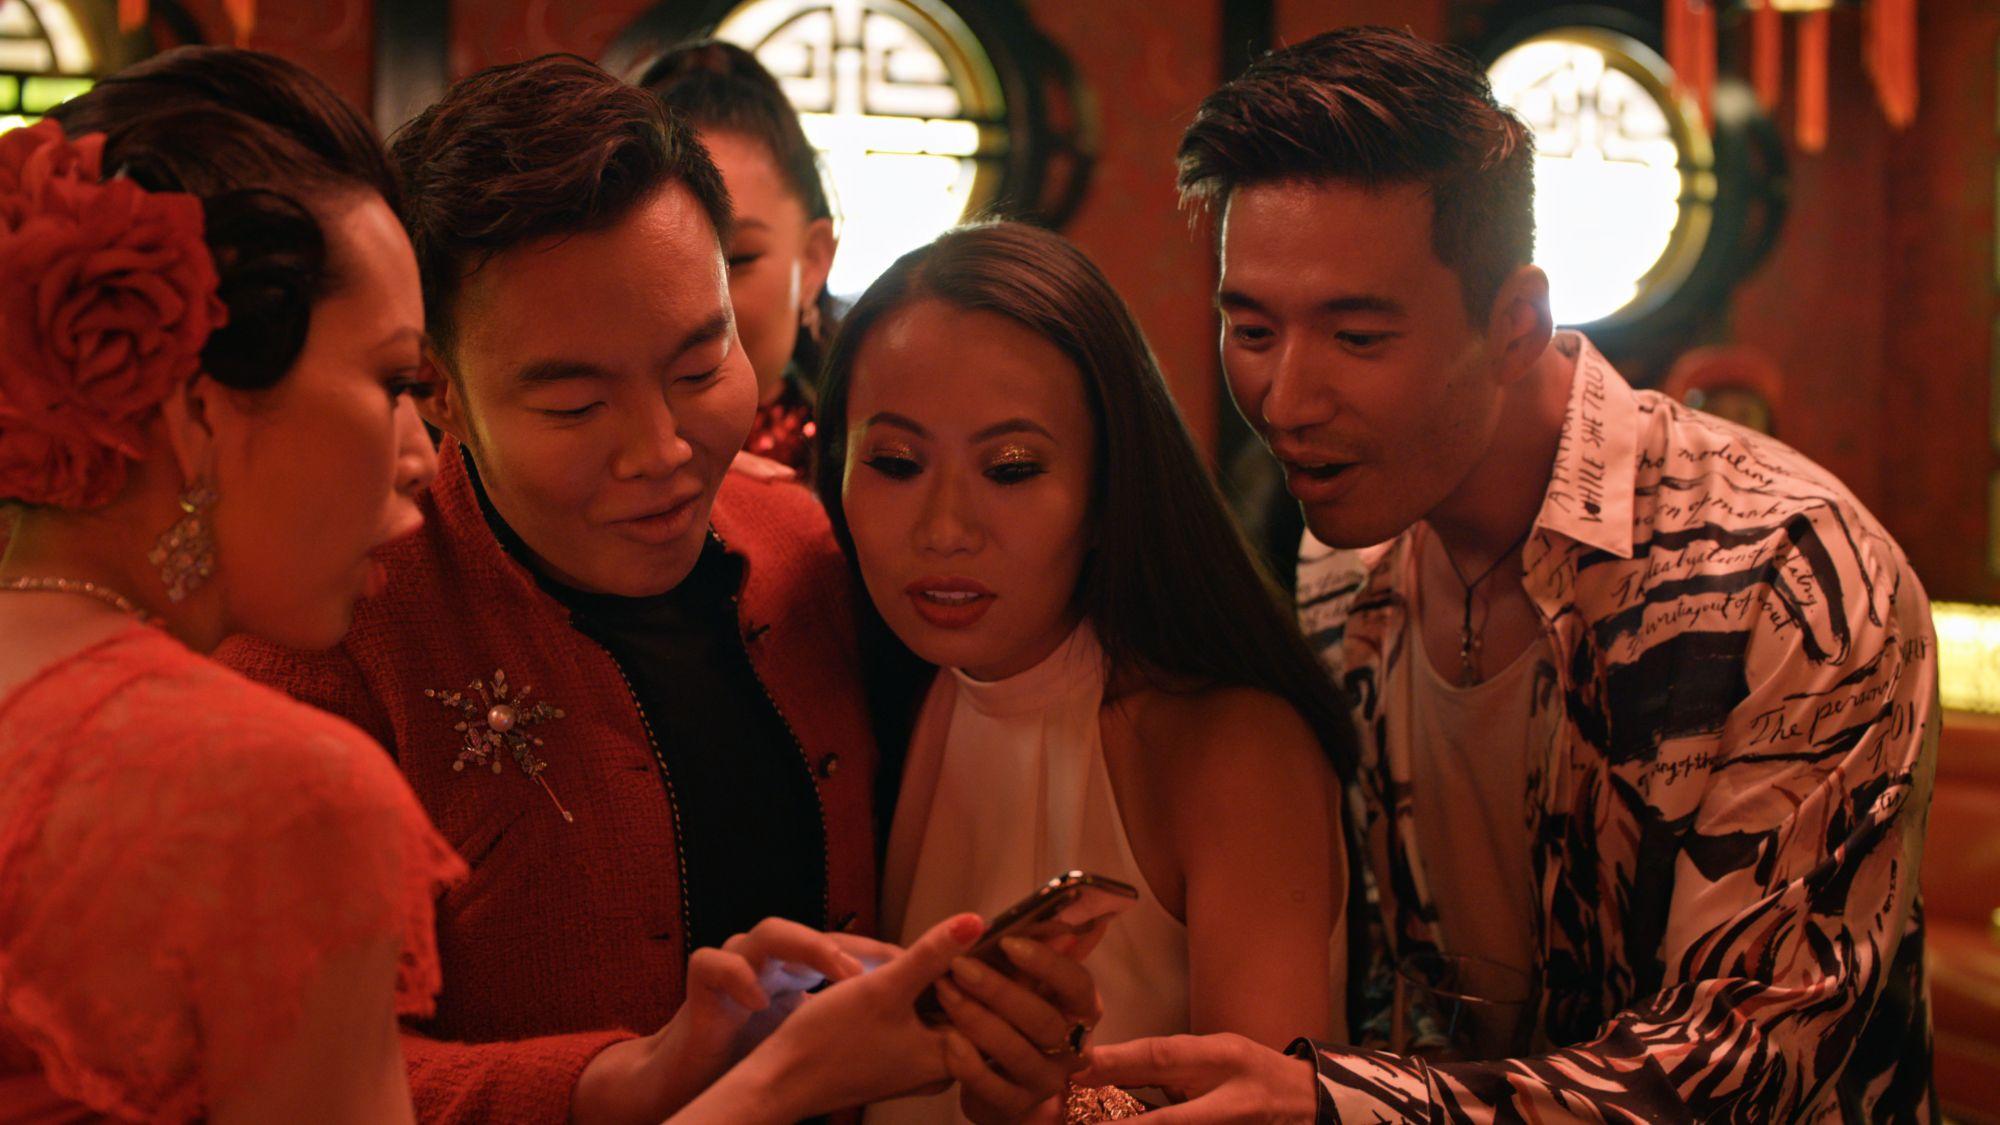 "(L-R) Christine Chiu, Kane Lim, Kelly Mi Li and Kevin Kreider. in episode 3 ""What's in Anna's Shower?"" of Bling Empire: Season 1. c. Courtesy of Netflix © 2021"